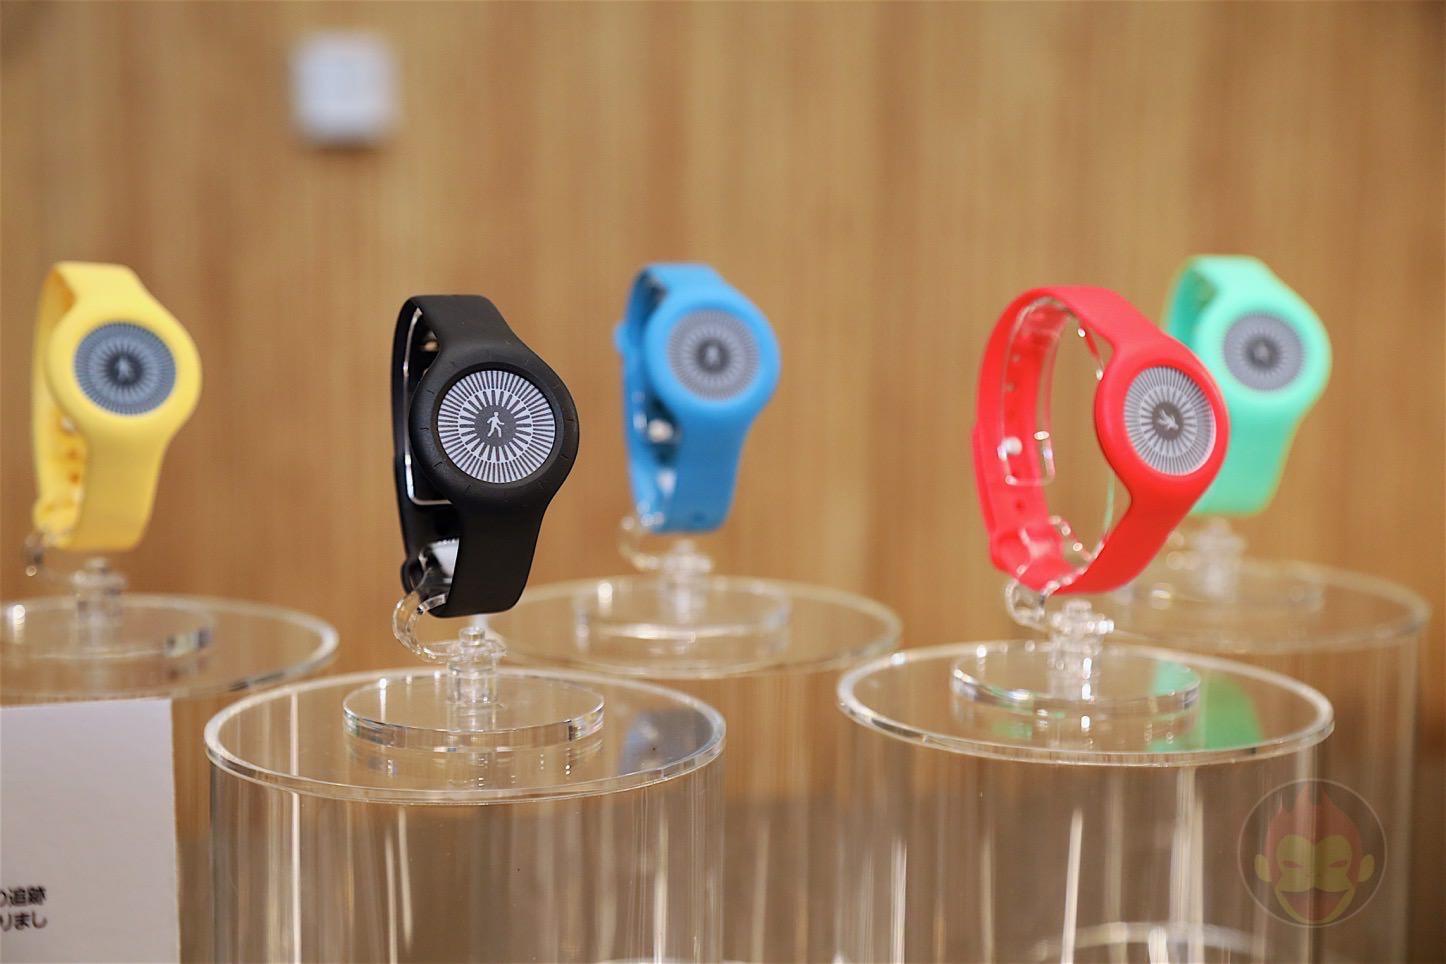 Nokia、10年ぶりに日本再進出へーーデジタルヘルス分野に注力